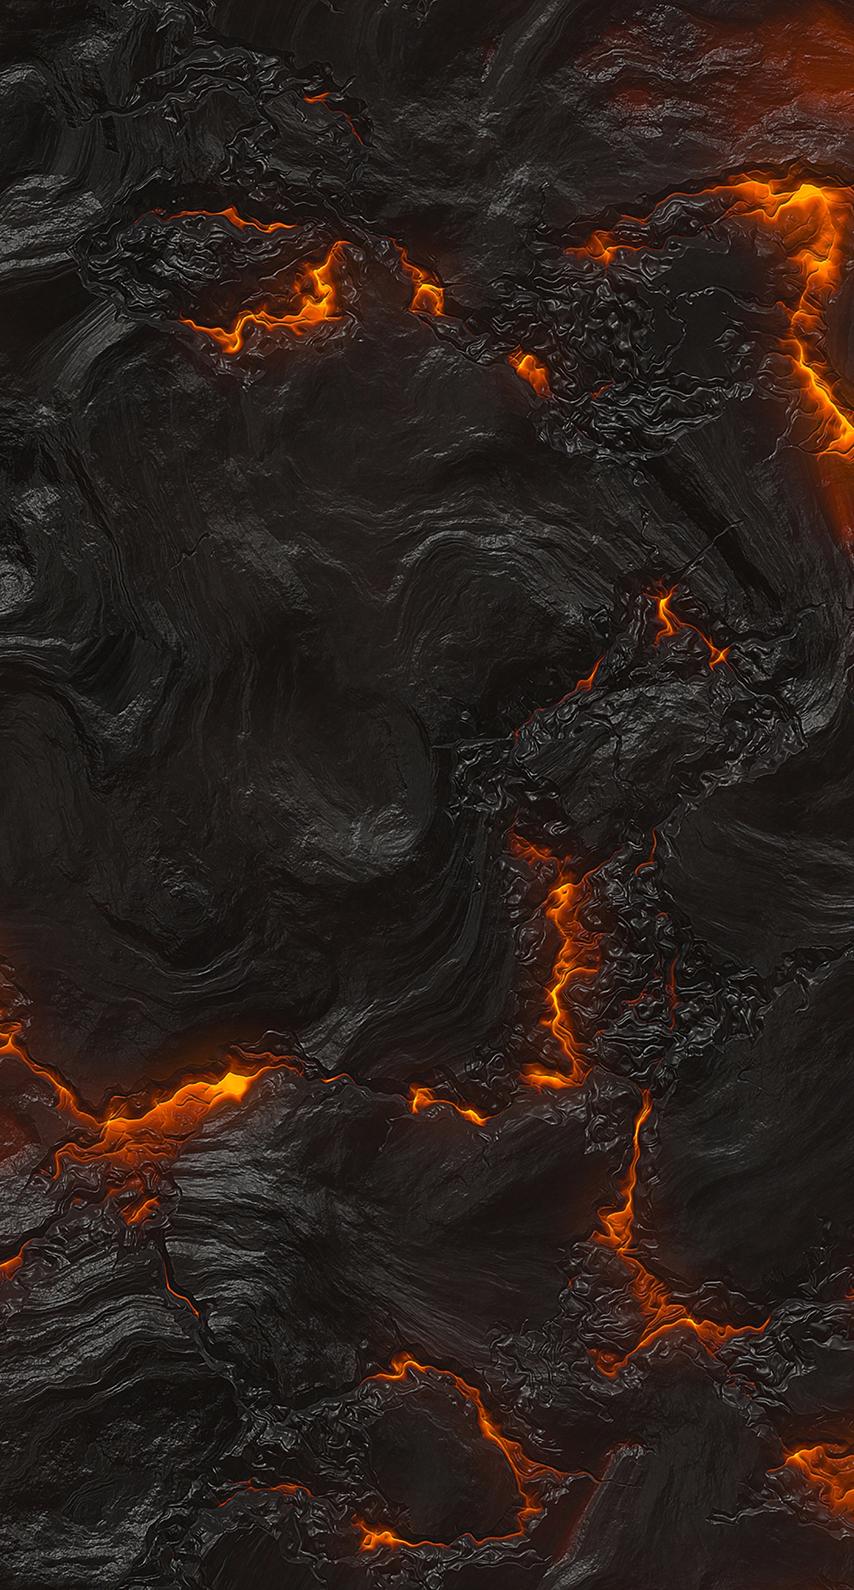 hot, bonfire, heat, blaze, inferno, fireplace, wildfire, burn, campfire, warmly, danger, fuel, coal, firewood, calamity, energy